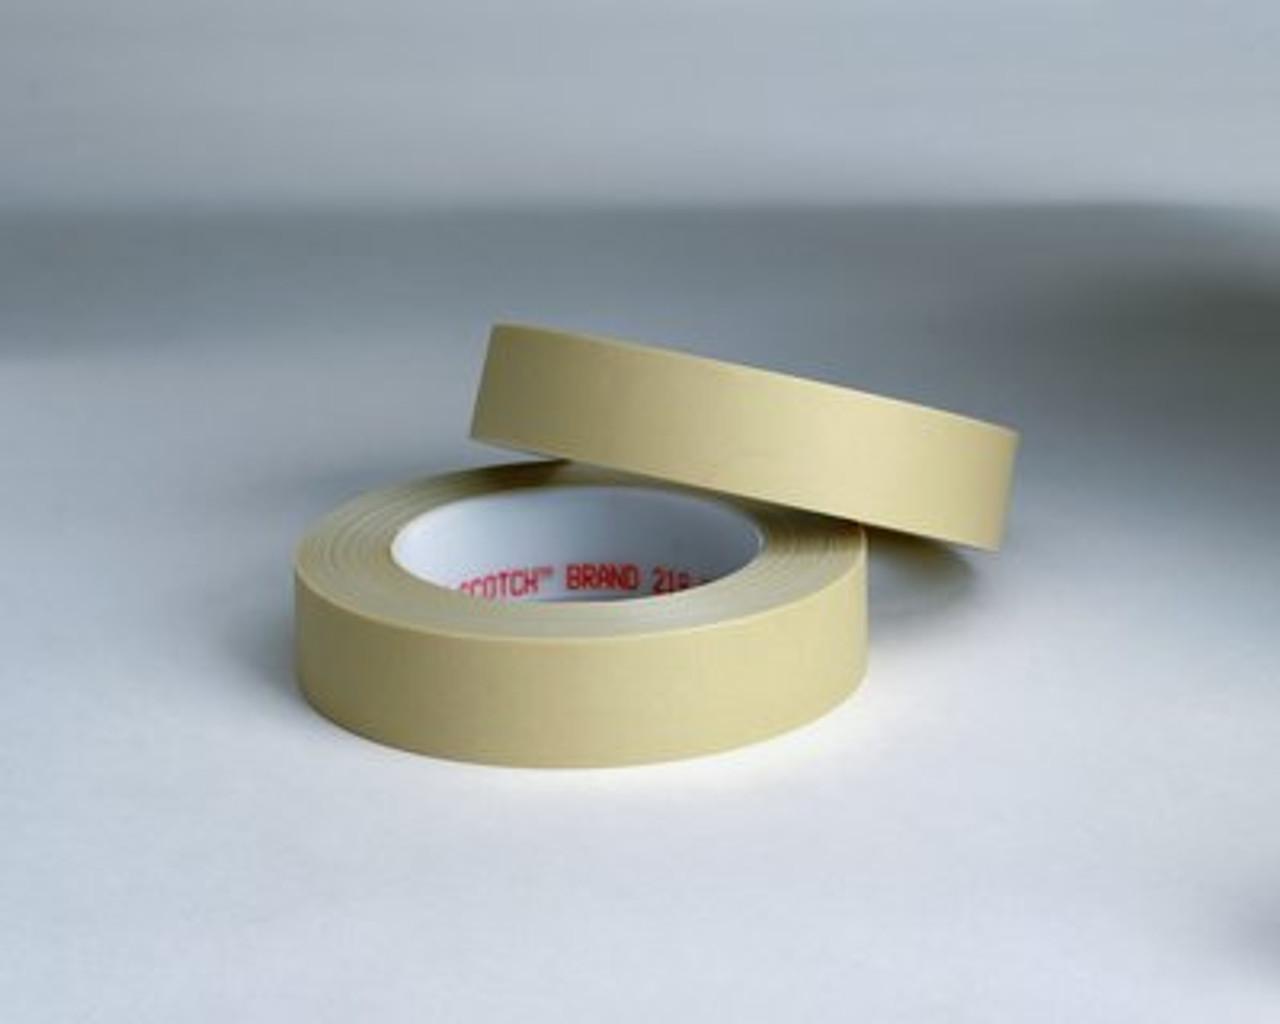 "1 Roll 3M Scotch Fine Line 218 Paint Masking Tape 3//8""x 60 yd"